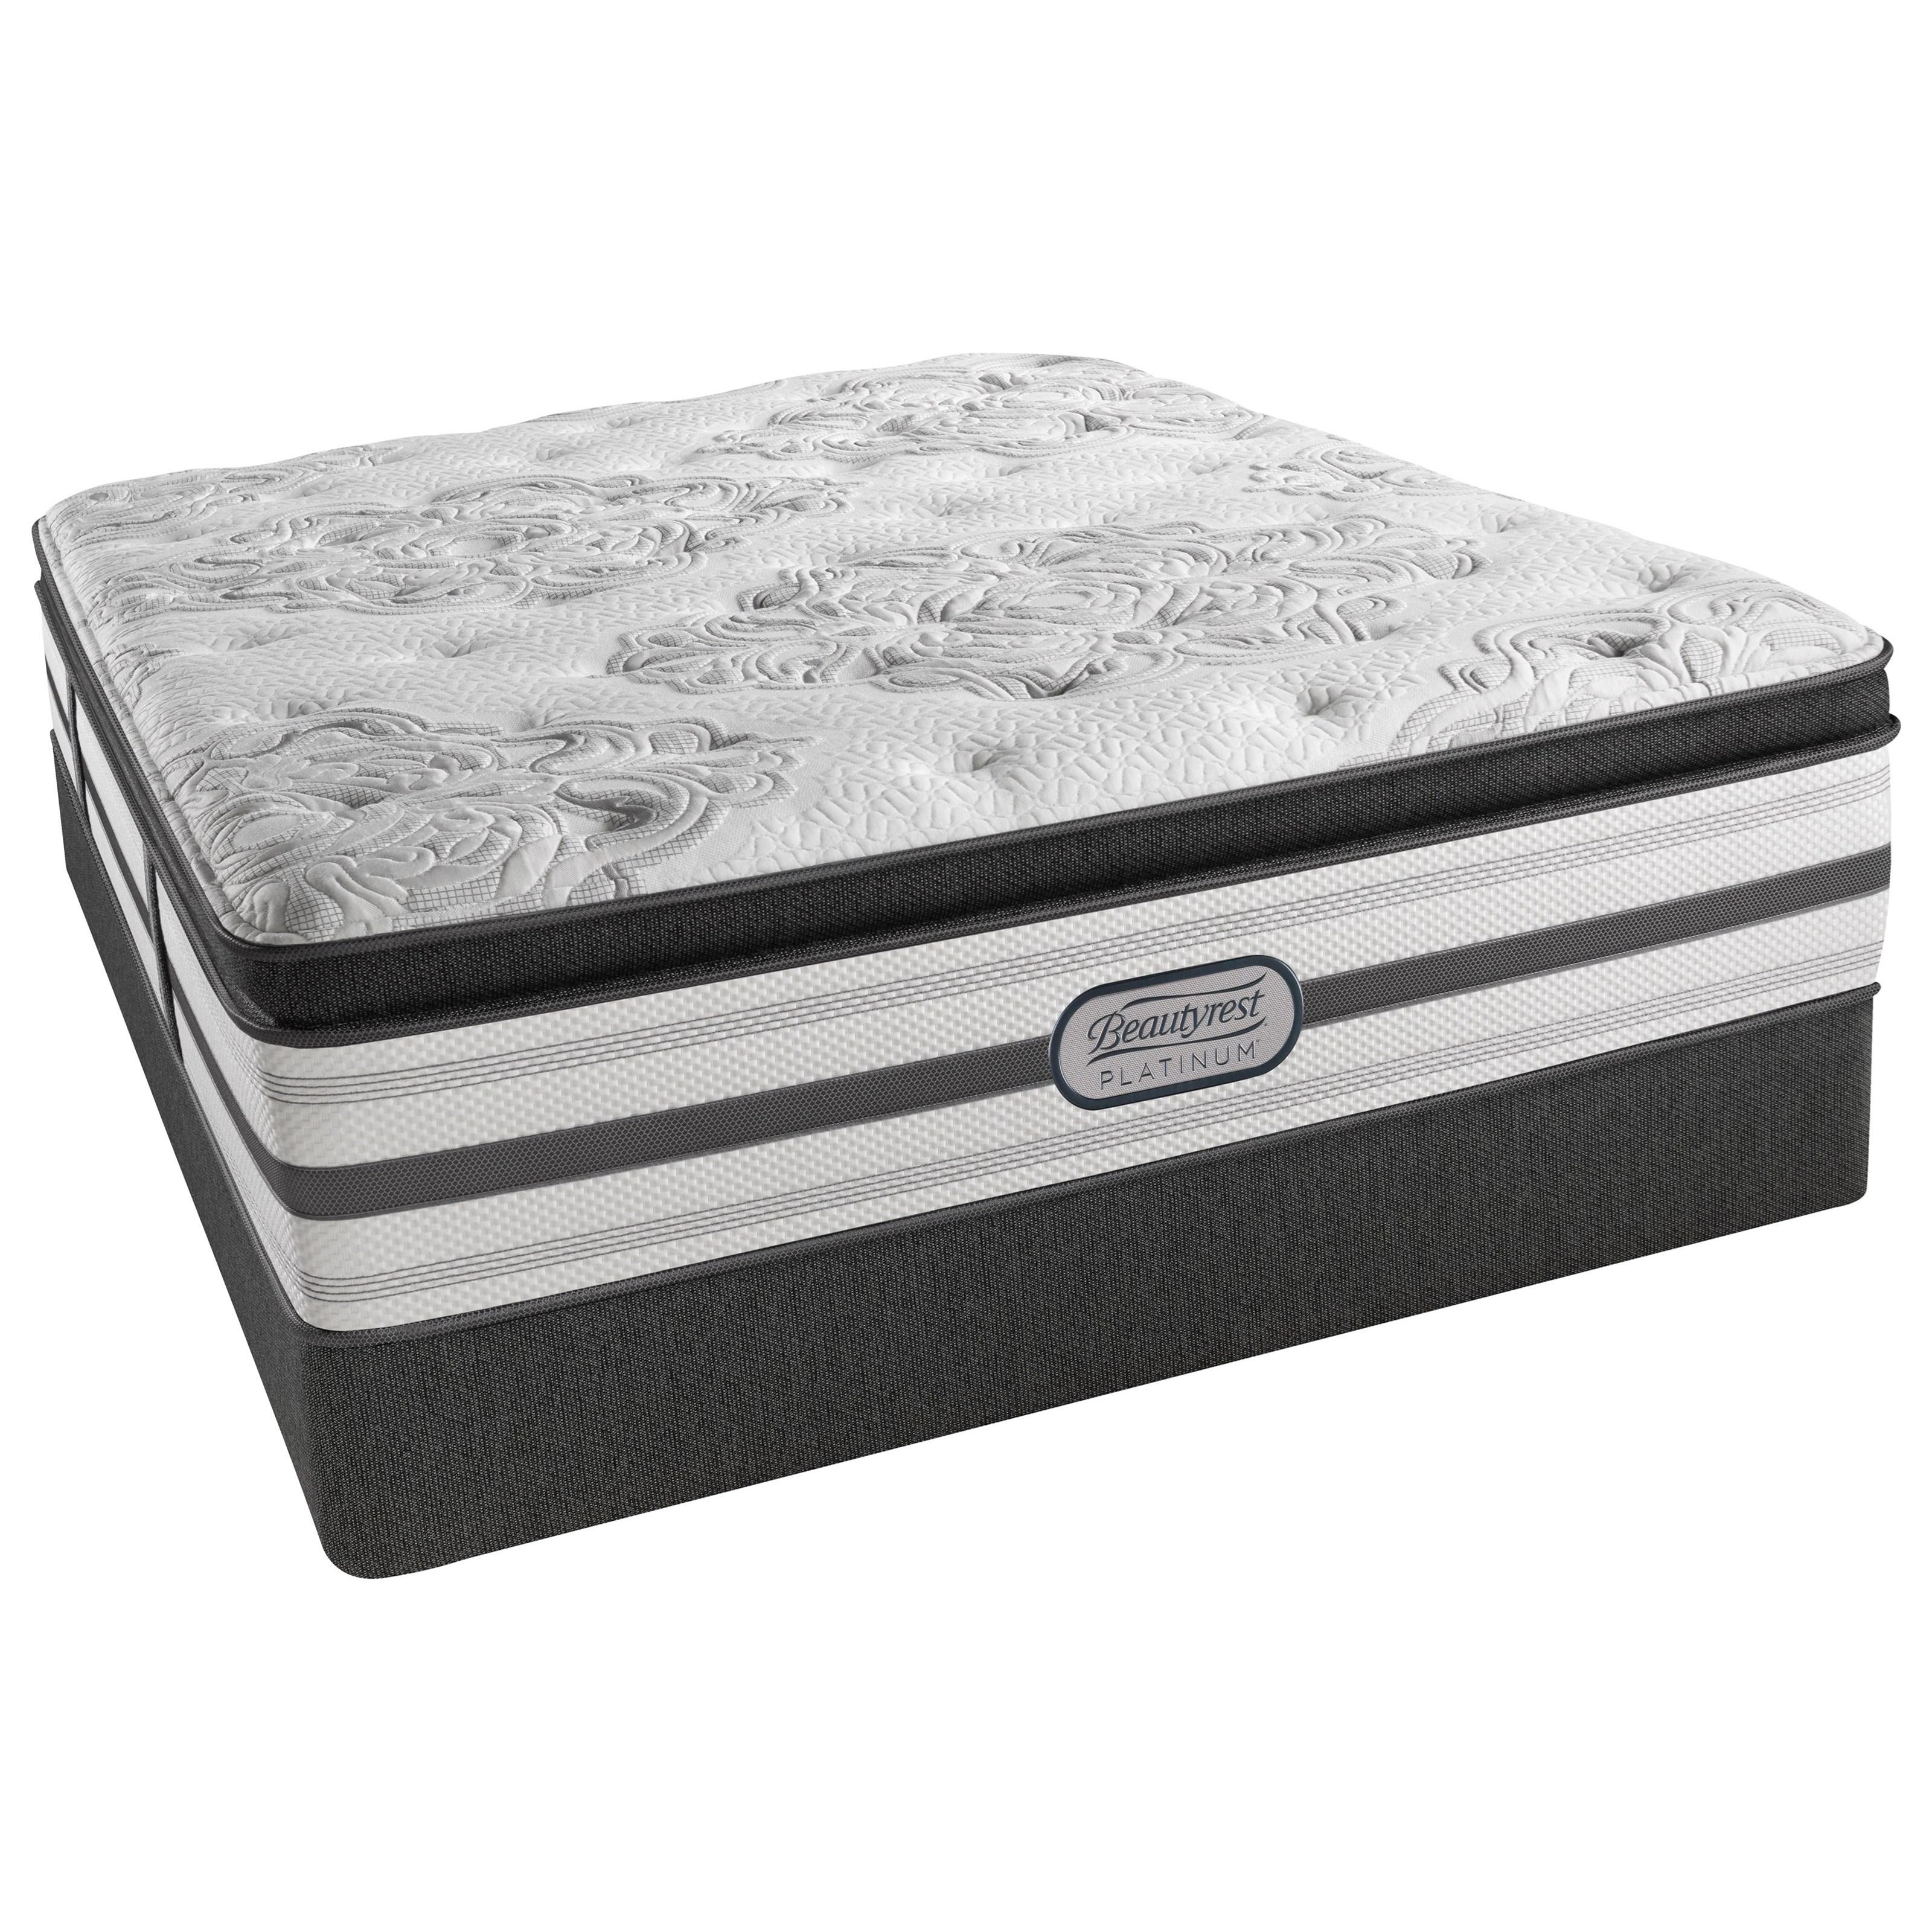 "Simmons Belgrade Plush PT Full Plush Pillow Top 15"" Mattress Set - Item Number: LV3PLPT-F+700600254-5030"